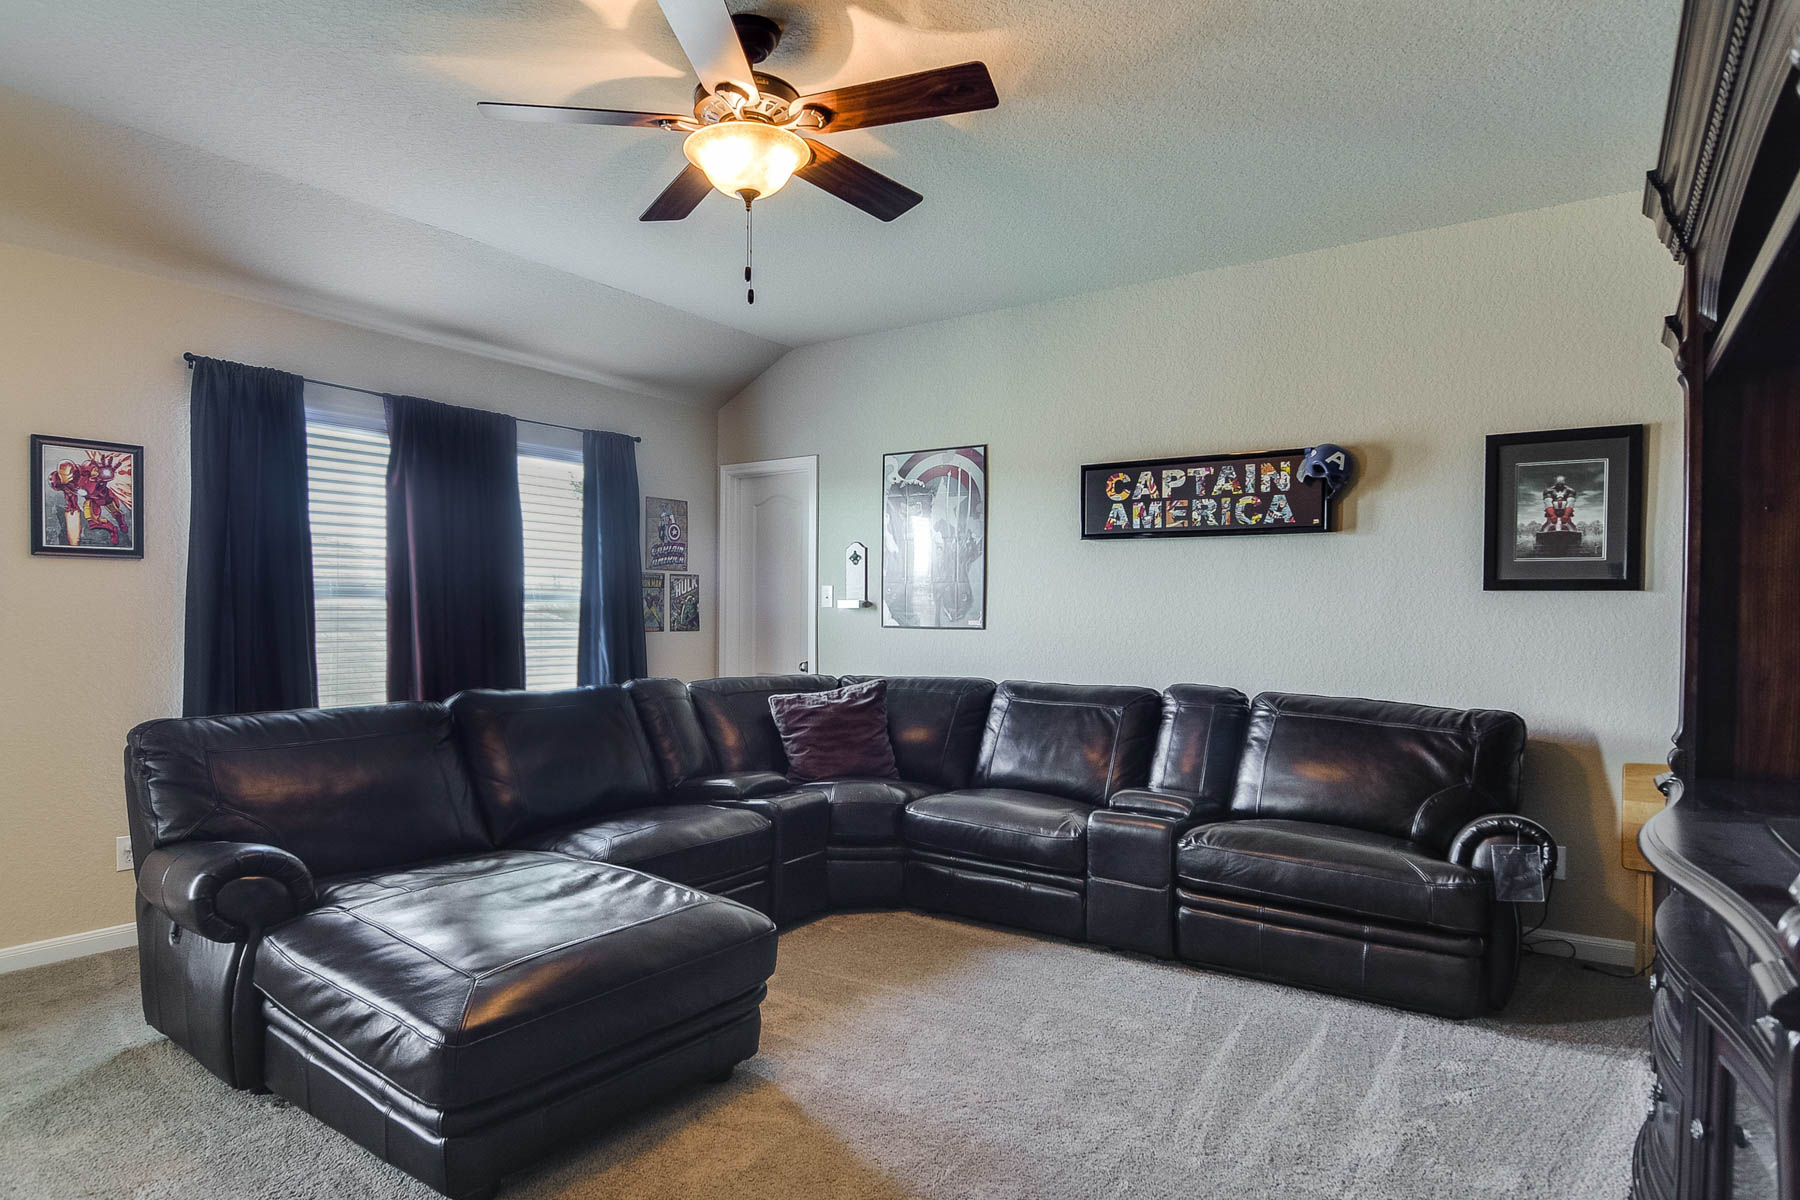 Additional photo for property listing at Wonderful Family Home in Wortham Oaks 22835 Allegro Crk San Antonio, Texas 78261 Estados Unidos